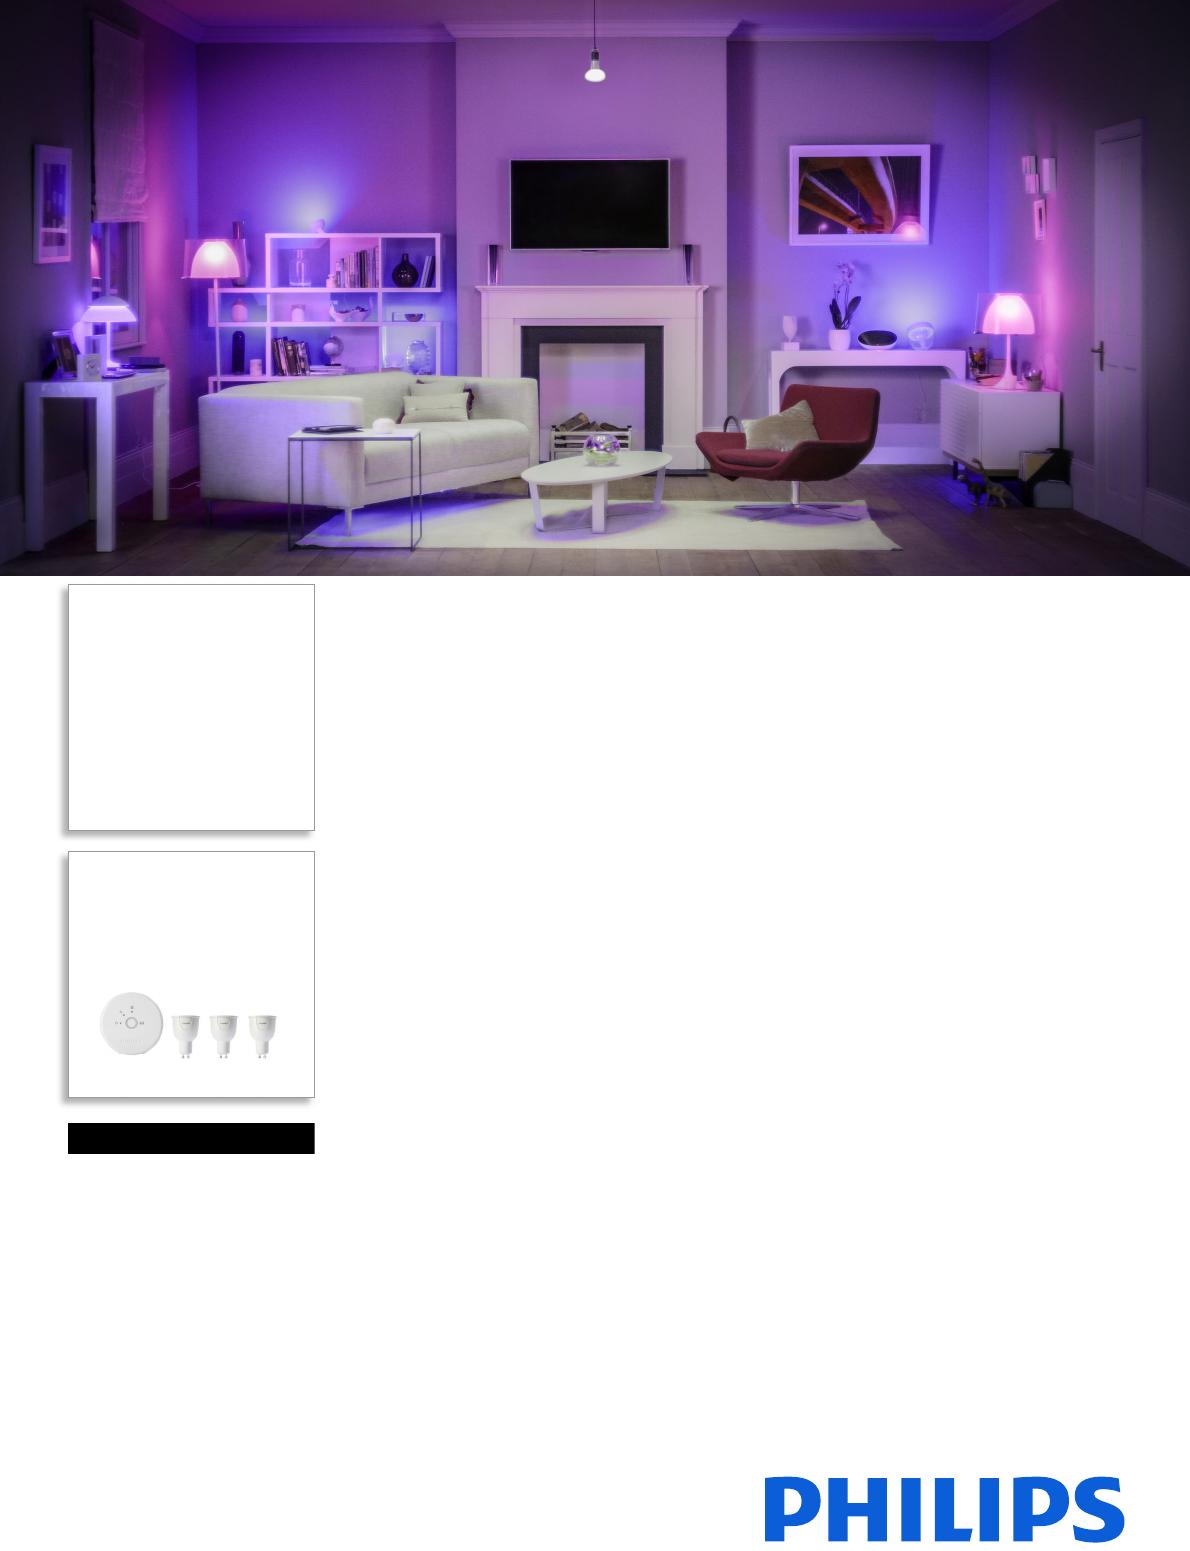 c14f2f67778 Philips 8718291770909 Personlig Trådløs Belysning User Manual Pss Dandk